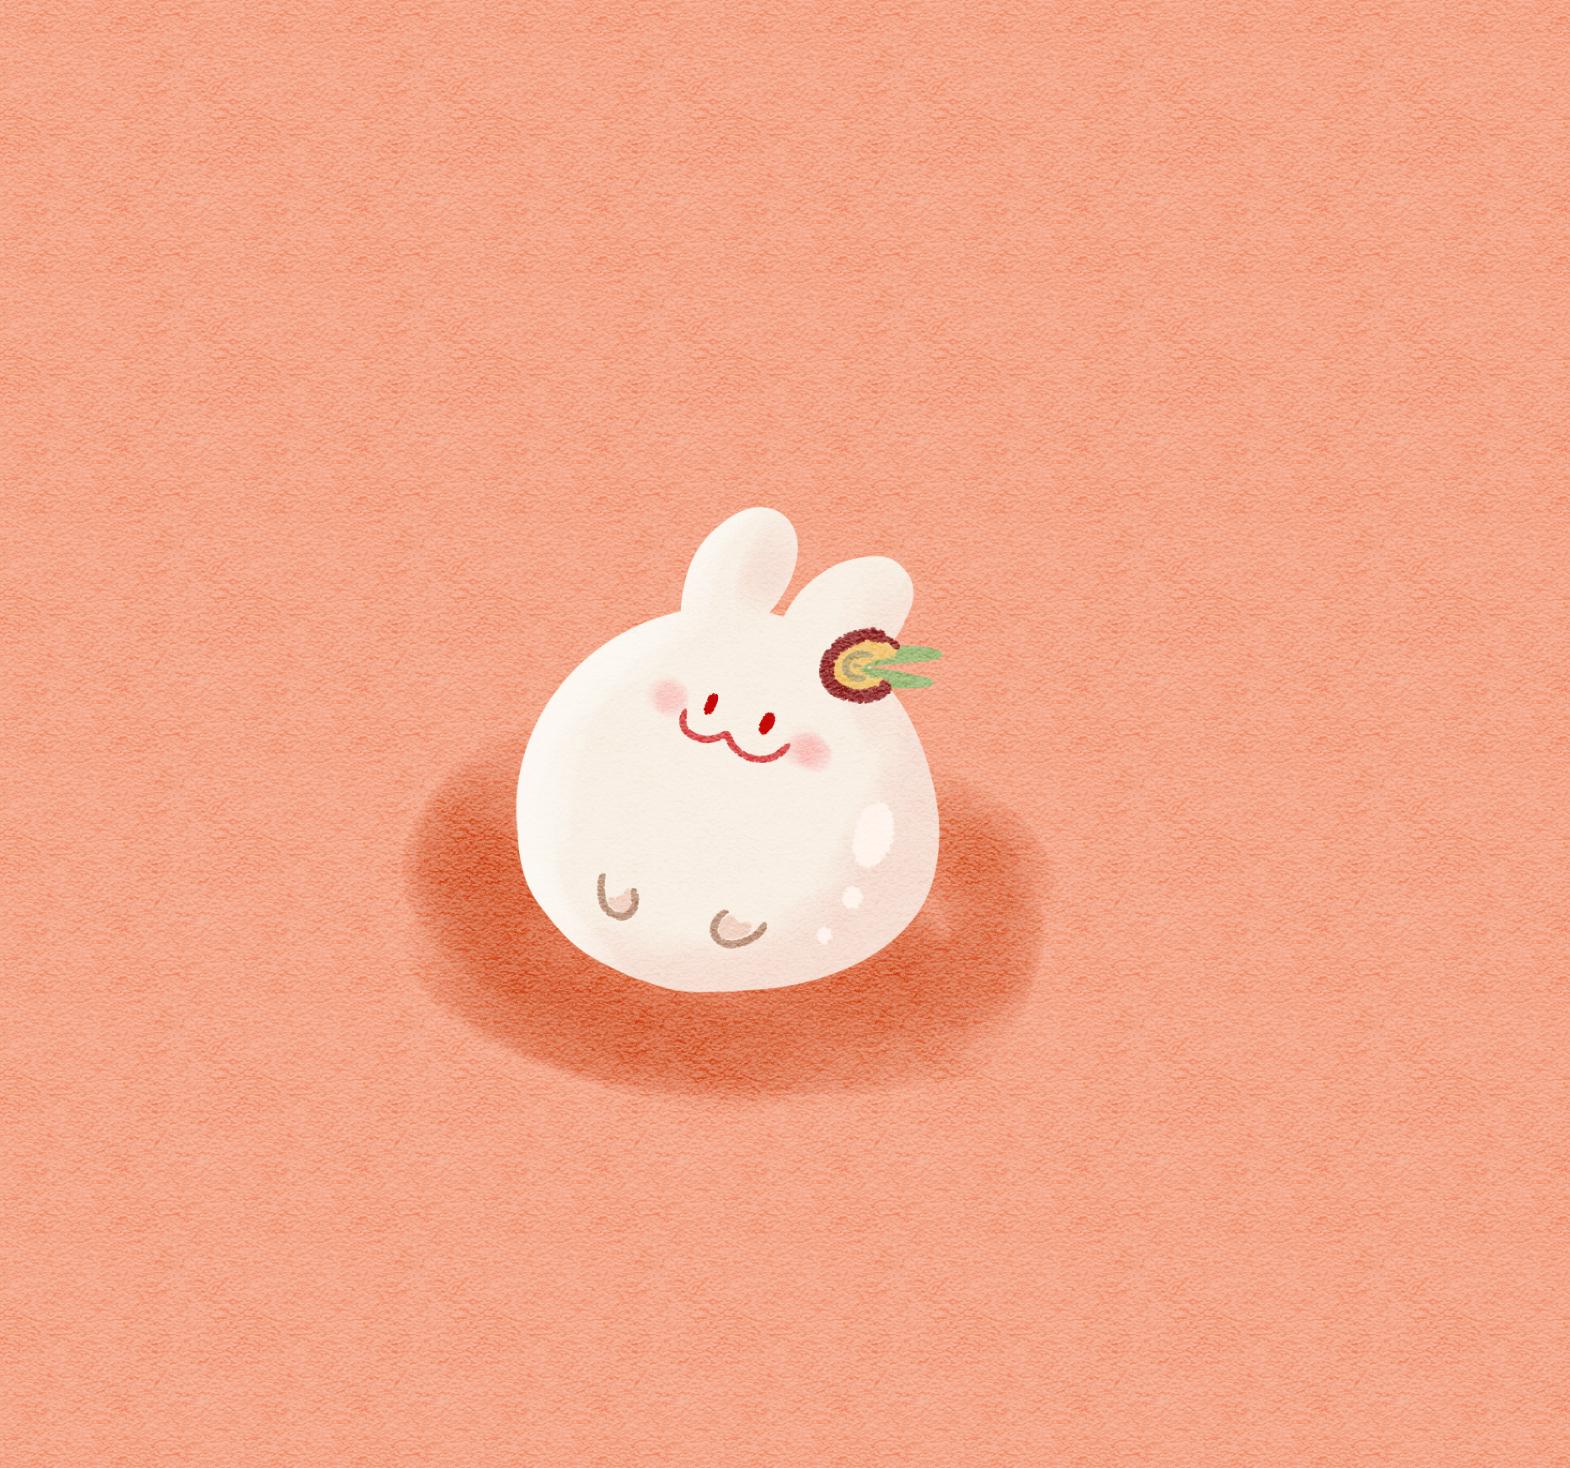 Moon Rabbit Cookie Rabbit Image 2933742   Zerochan Anime Image 1570x1468